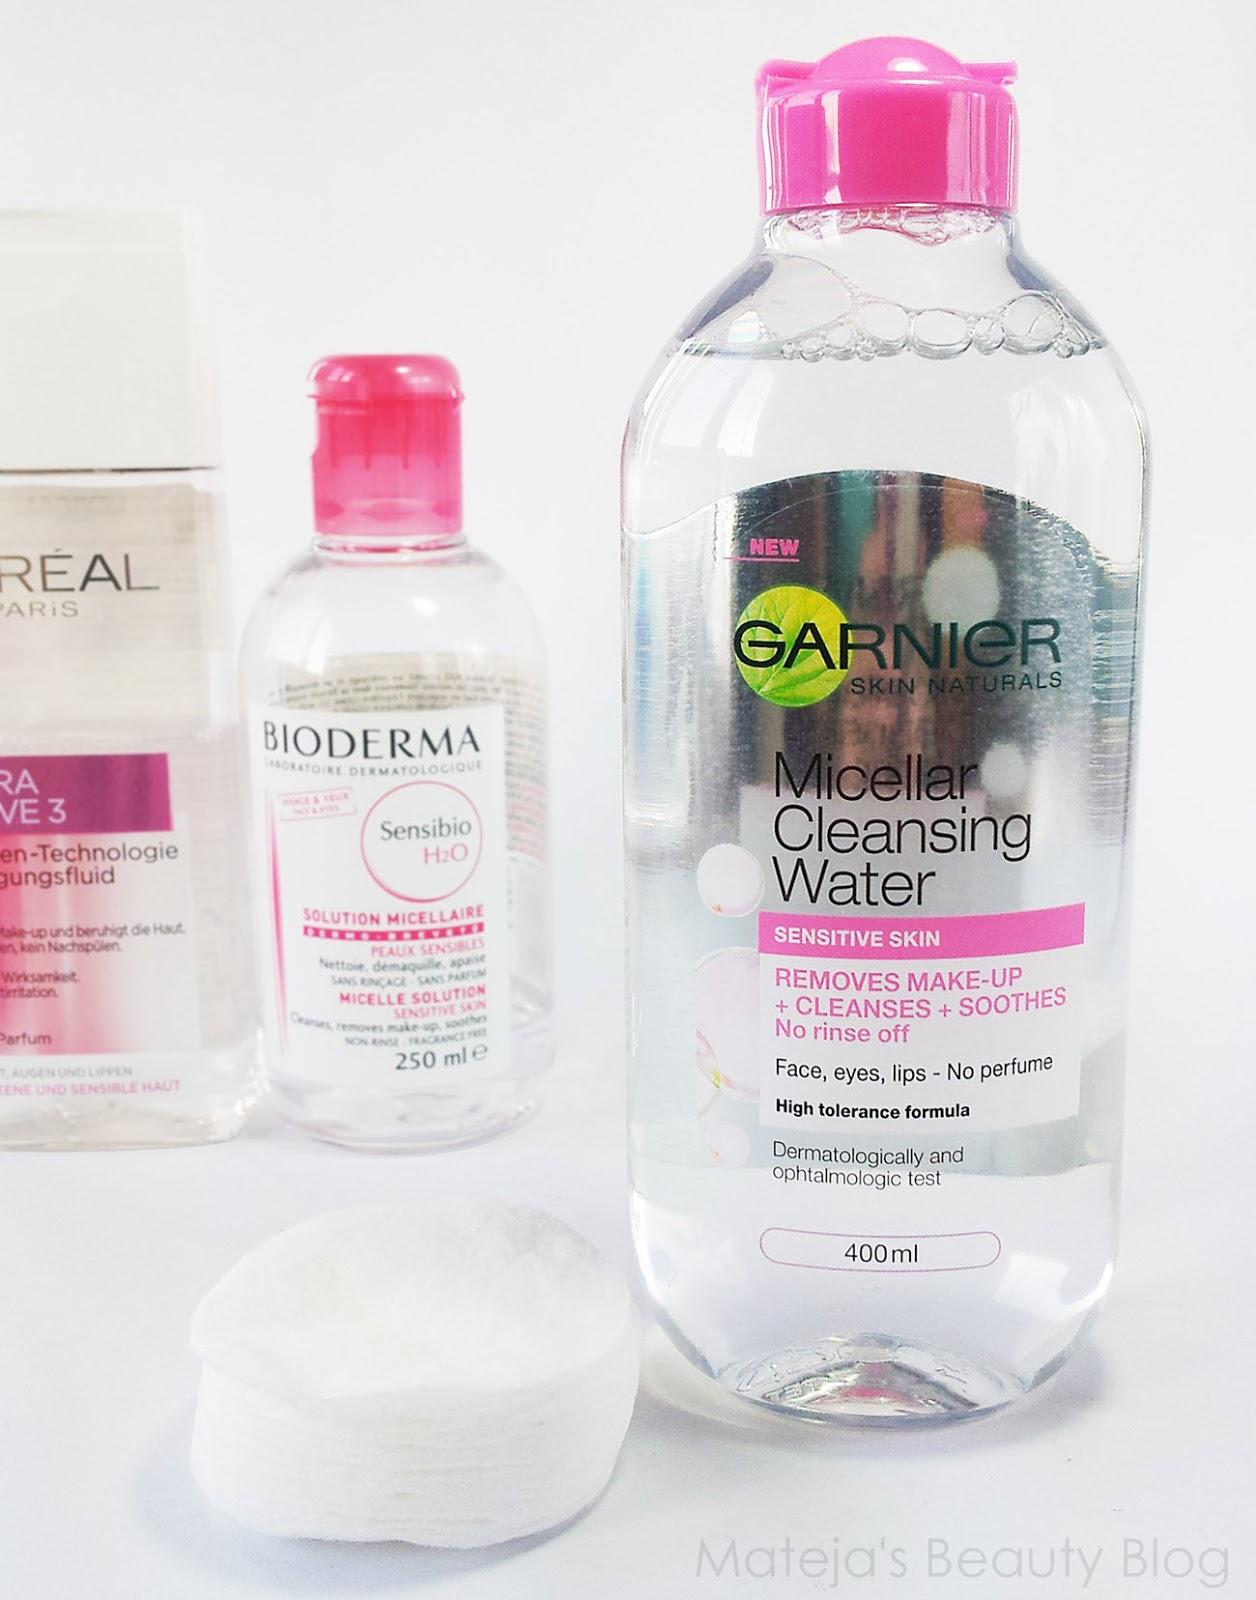 Garnier Micellar Cleansing Water Matejas Beauty Blog Bloglovin Holiday Series Hawaii Breeze 200ml